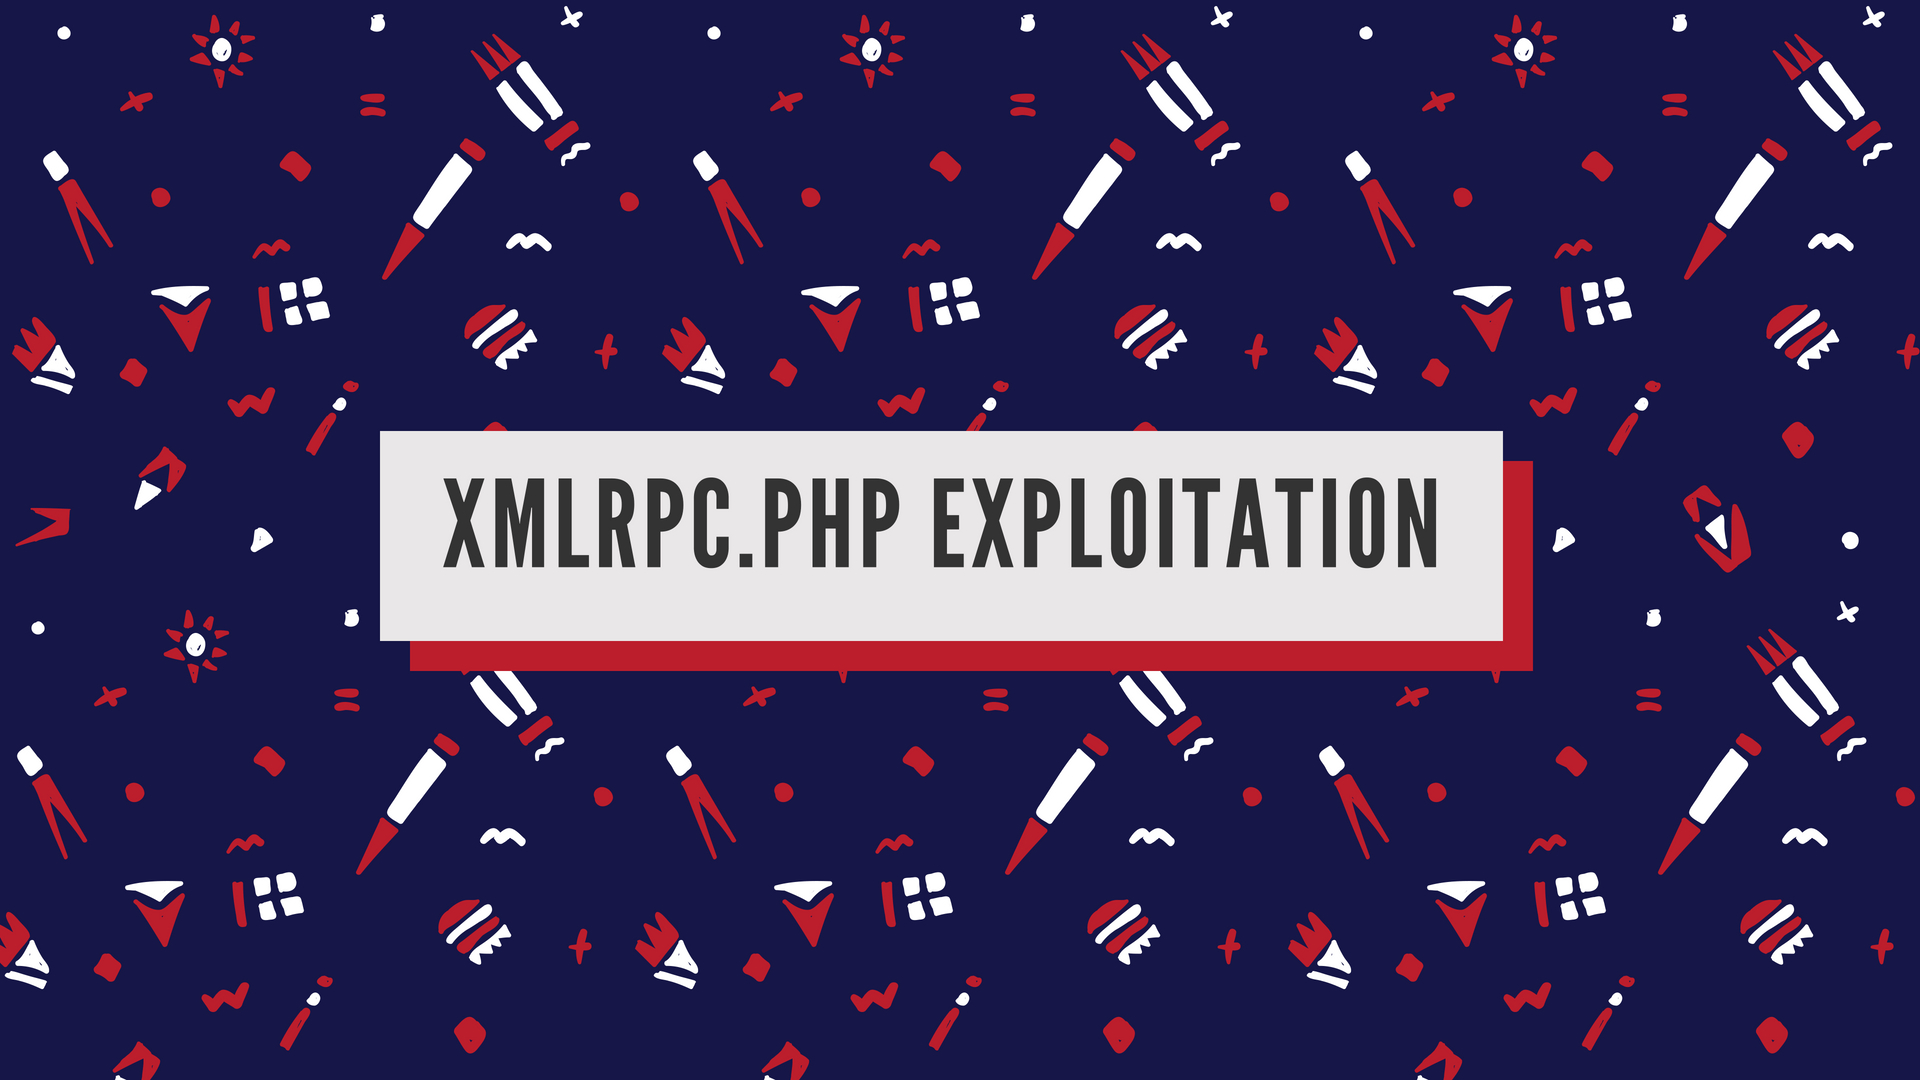 Live Detection and Exploitation of WordPress xmlrpc.php File - Yeah Hub